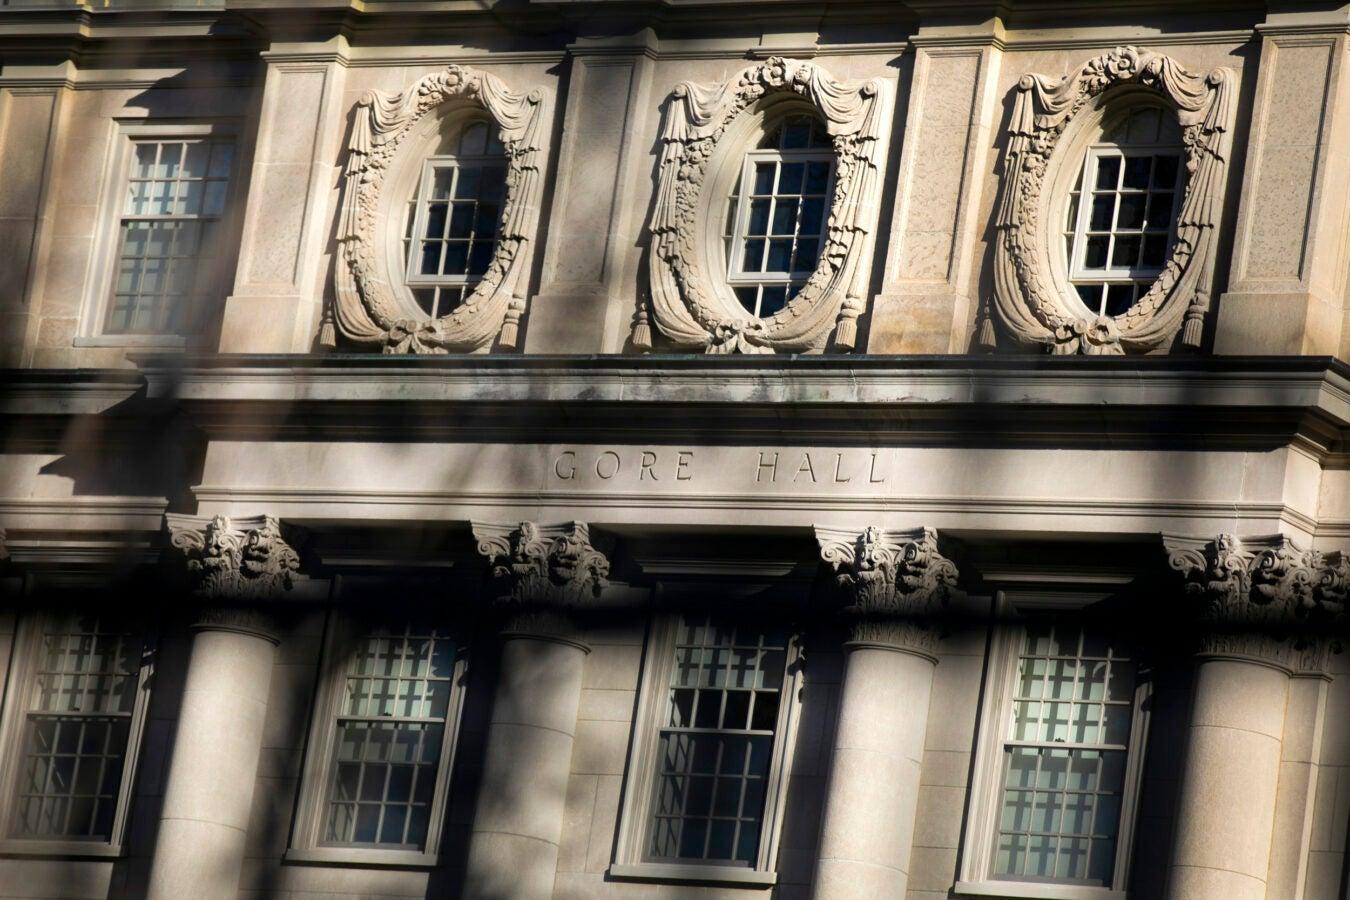 Gore Hall's limestone columns recall the late-17th century garden façade of Sir Christopher Wren's Hampton Court.